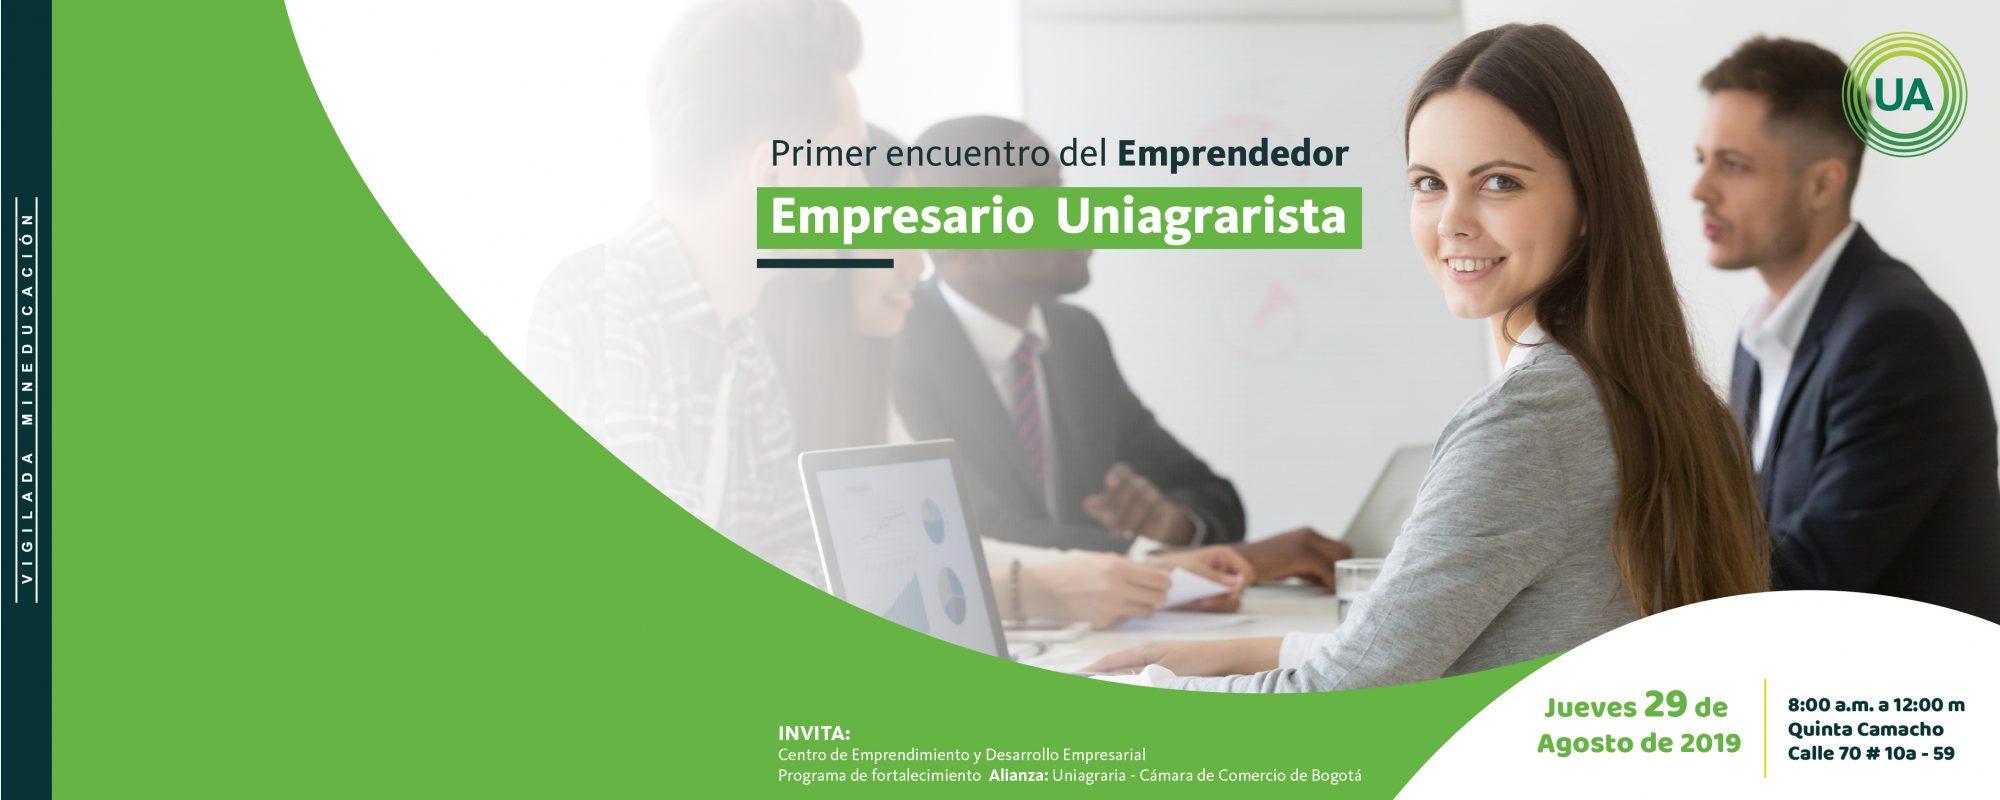 Encuentro empresario Uniagrarista